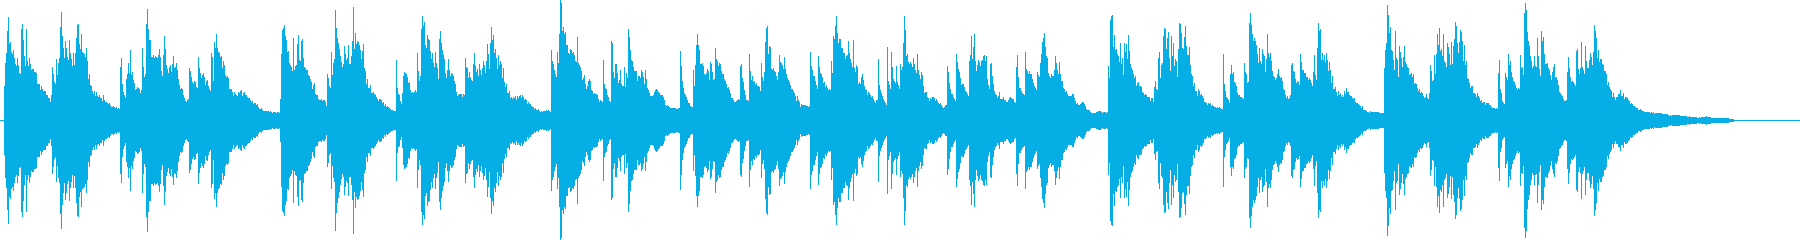 Trukish Guitarの再生済みの波形